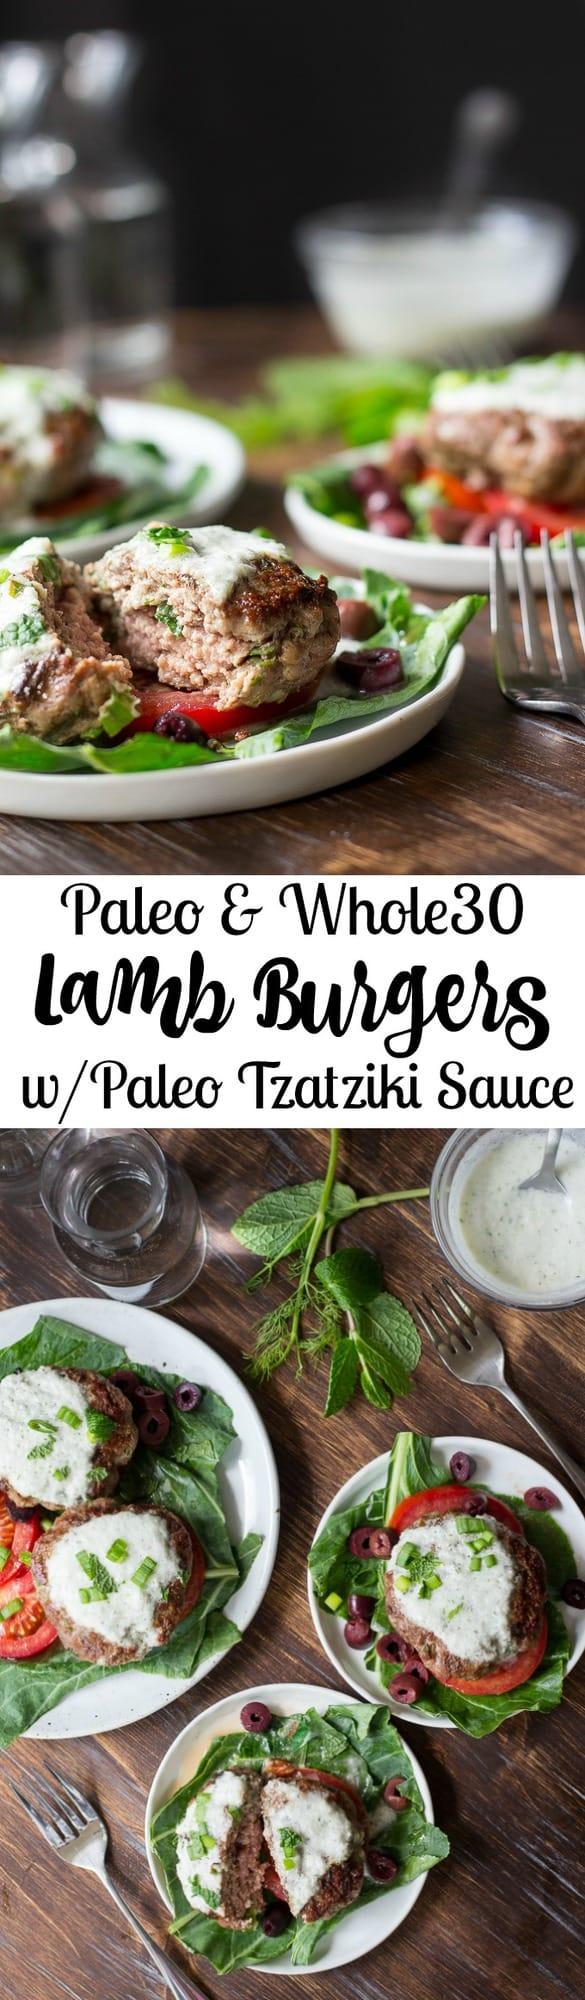 paleo-and-whole30-lamb-burgers-with-paleo-tzatziki-sauce